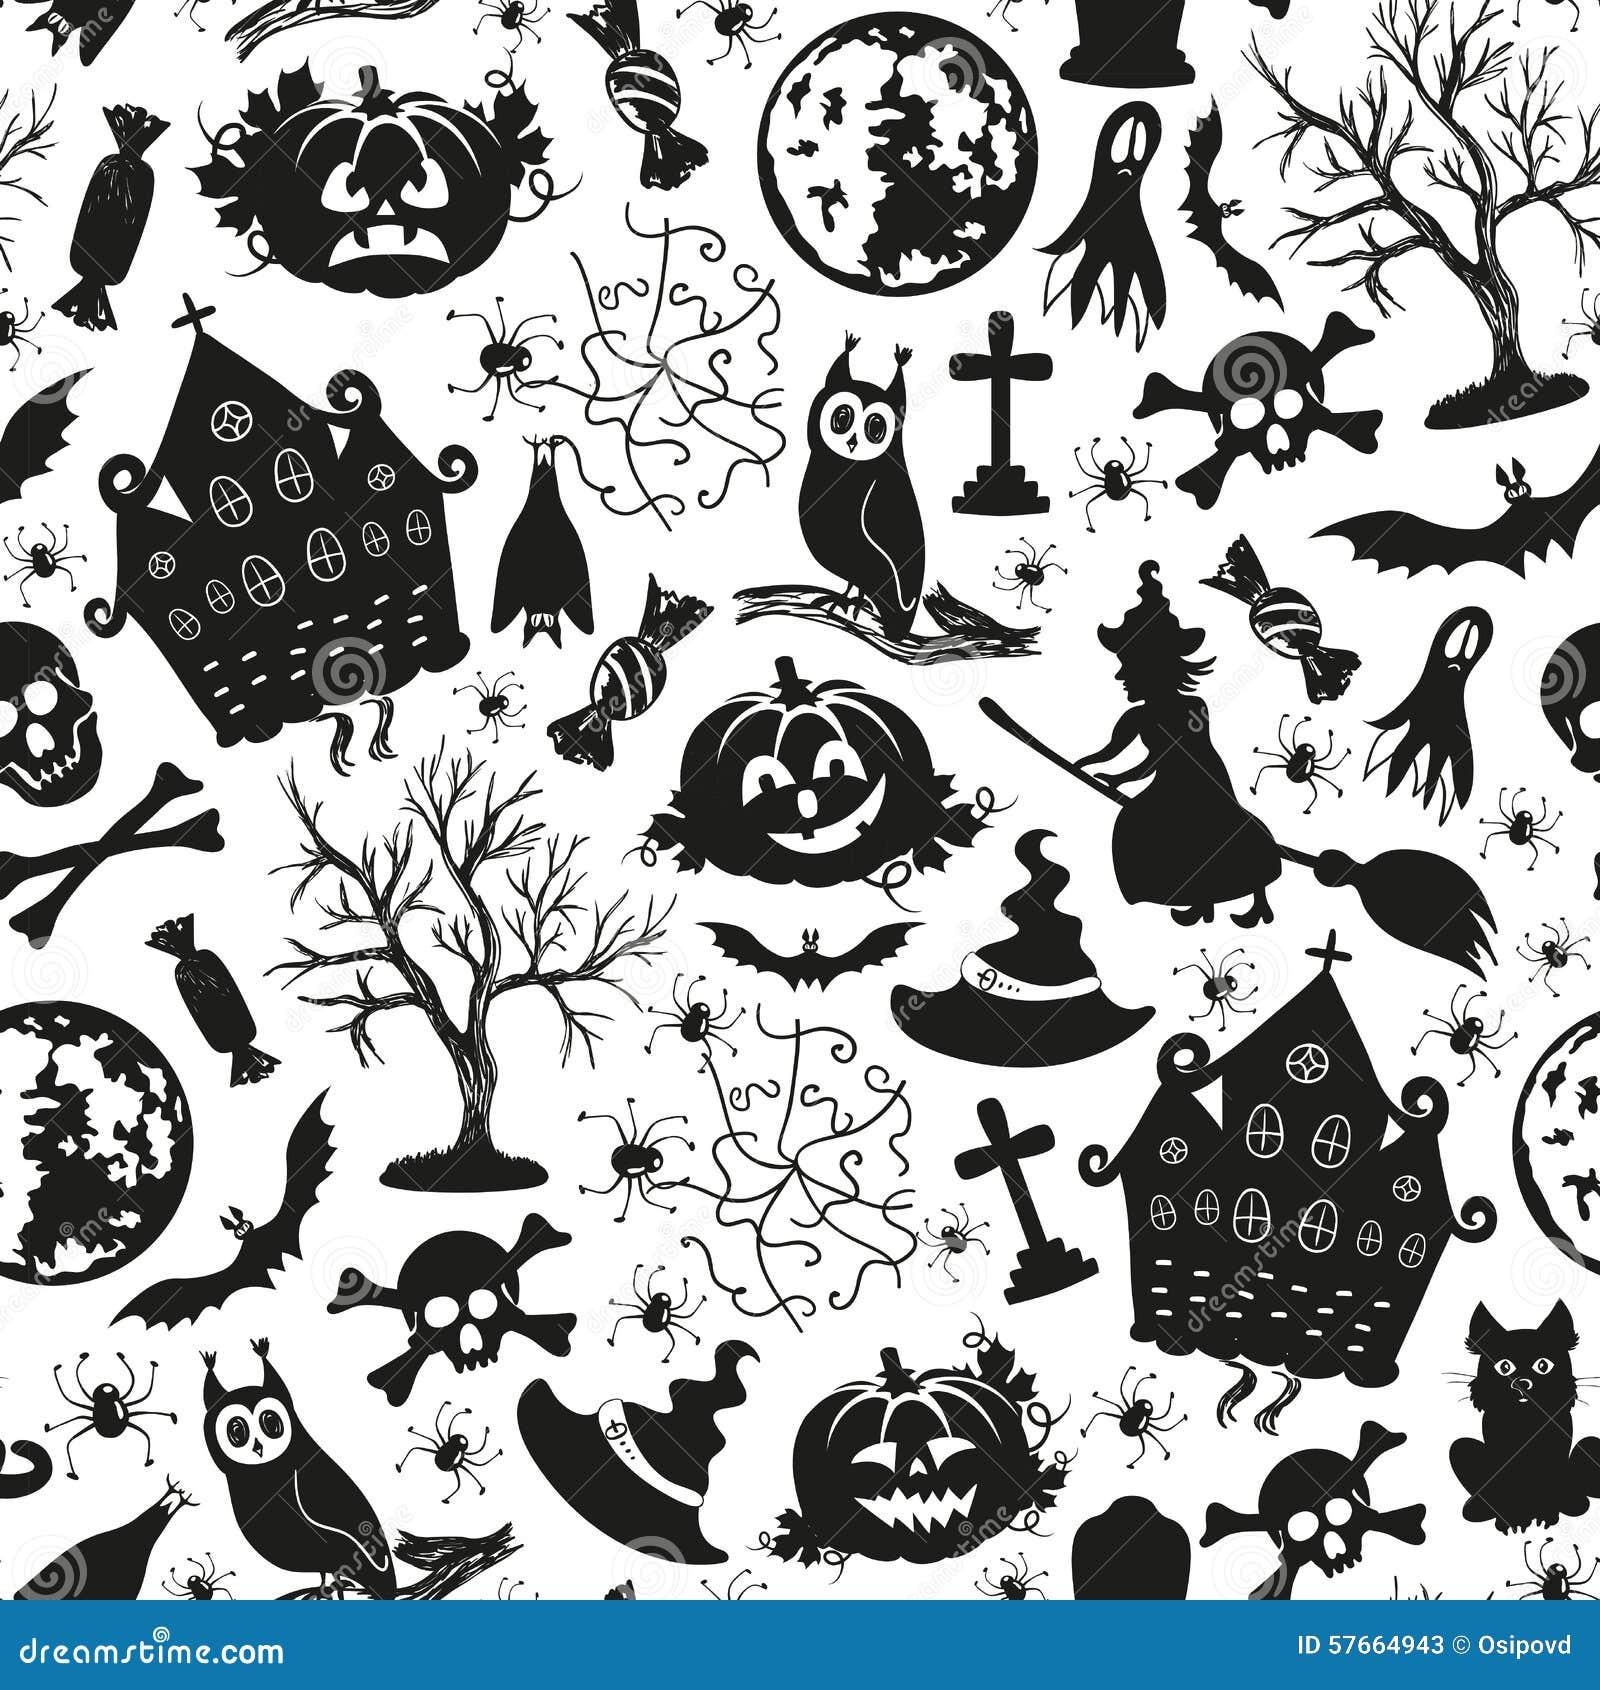 Icone senza cuciture del disegno per Halloween